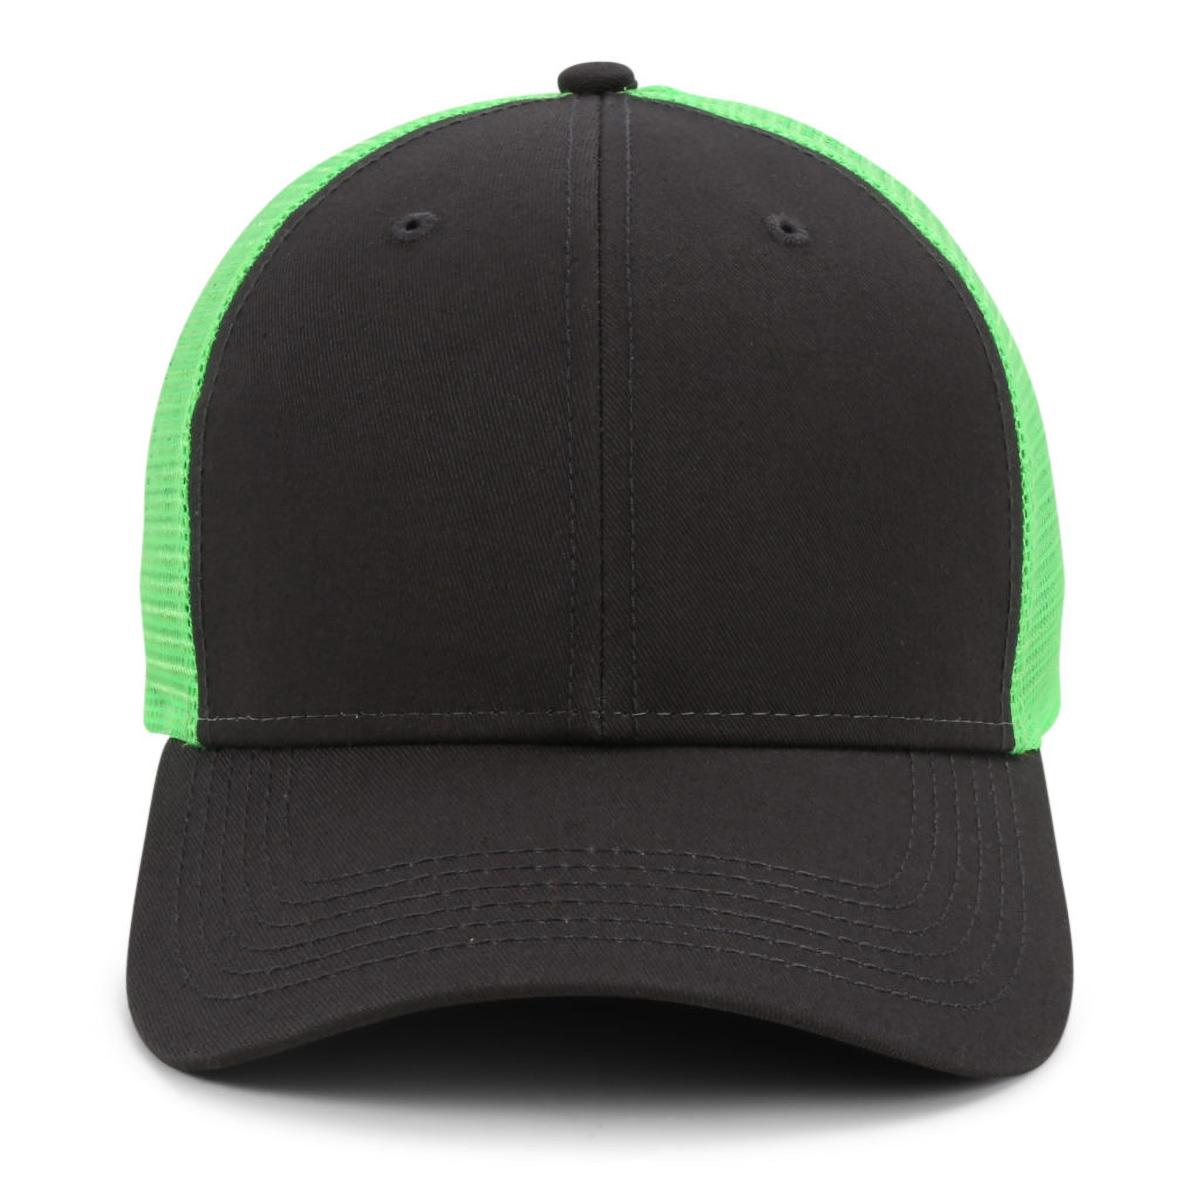 I200m charcoal neon green 01 1024x1024